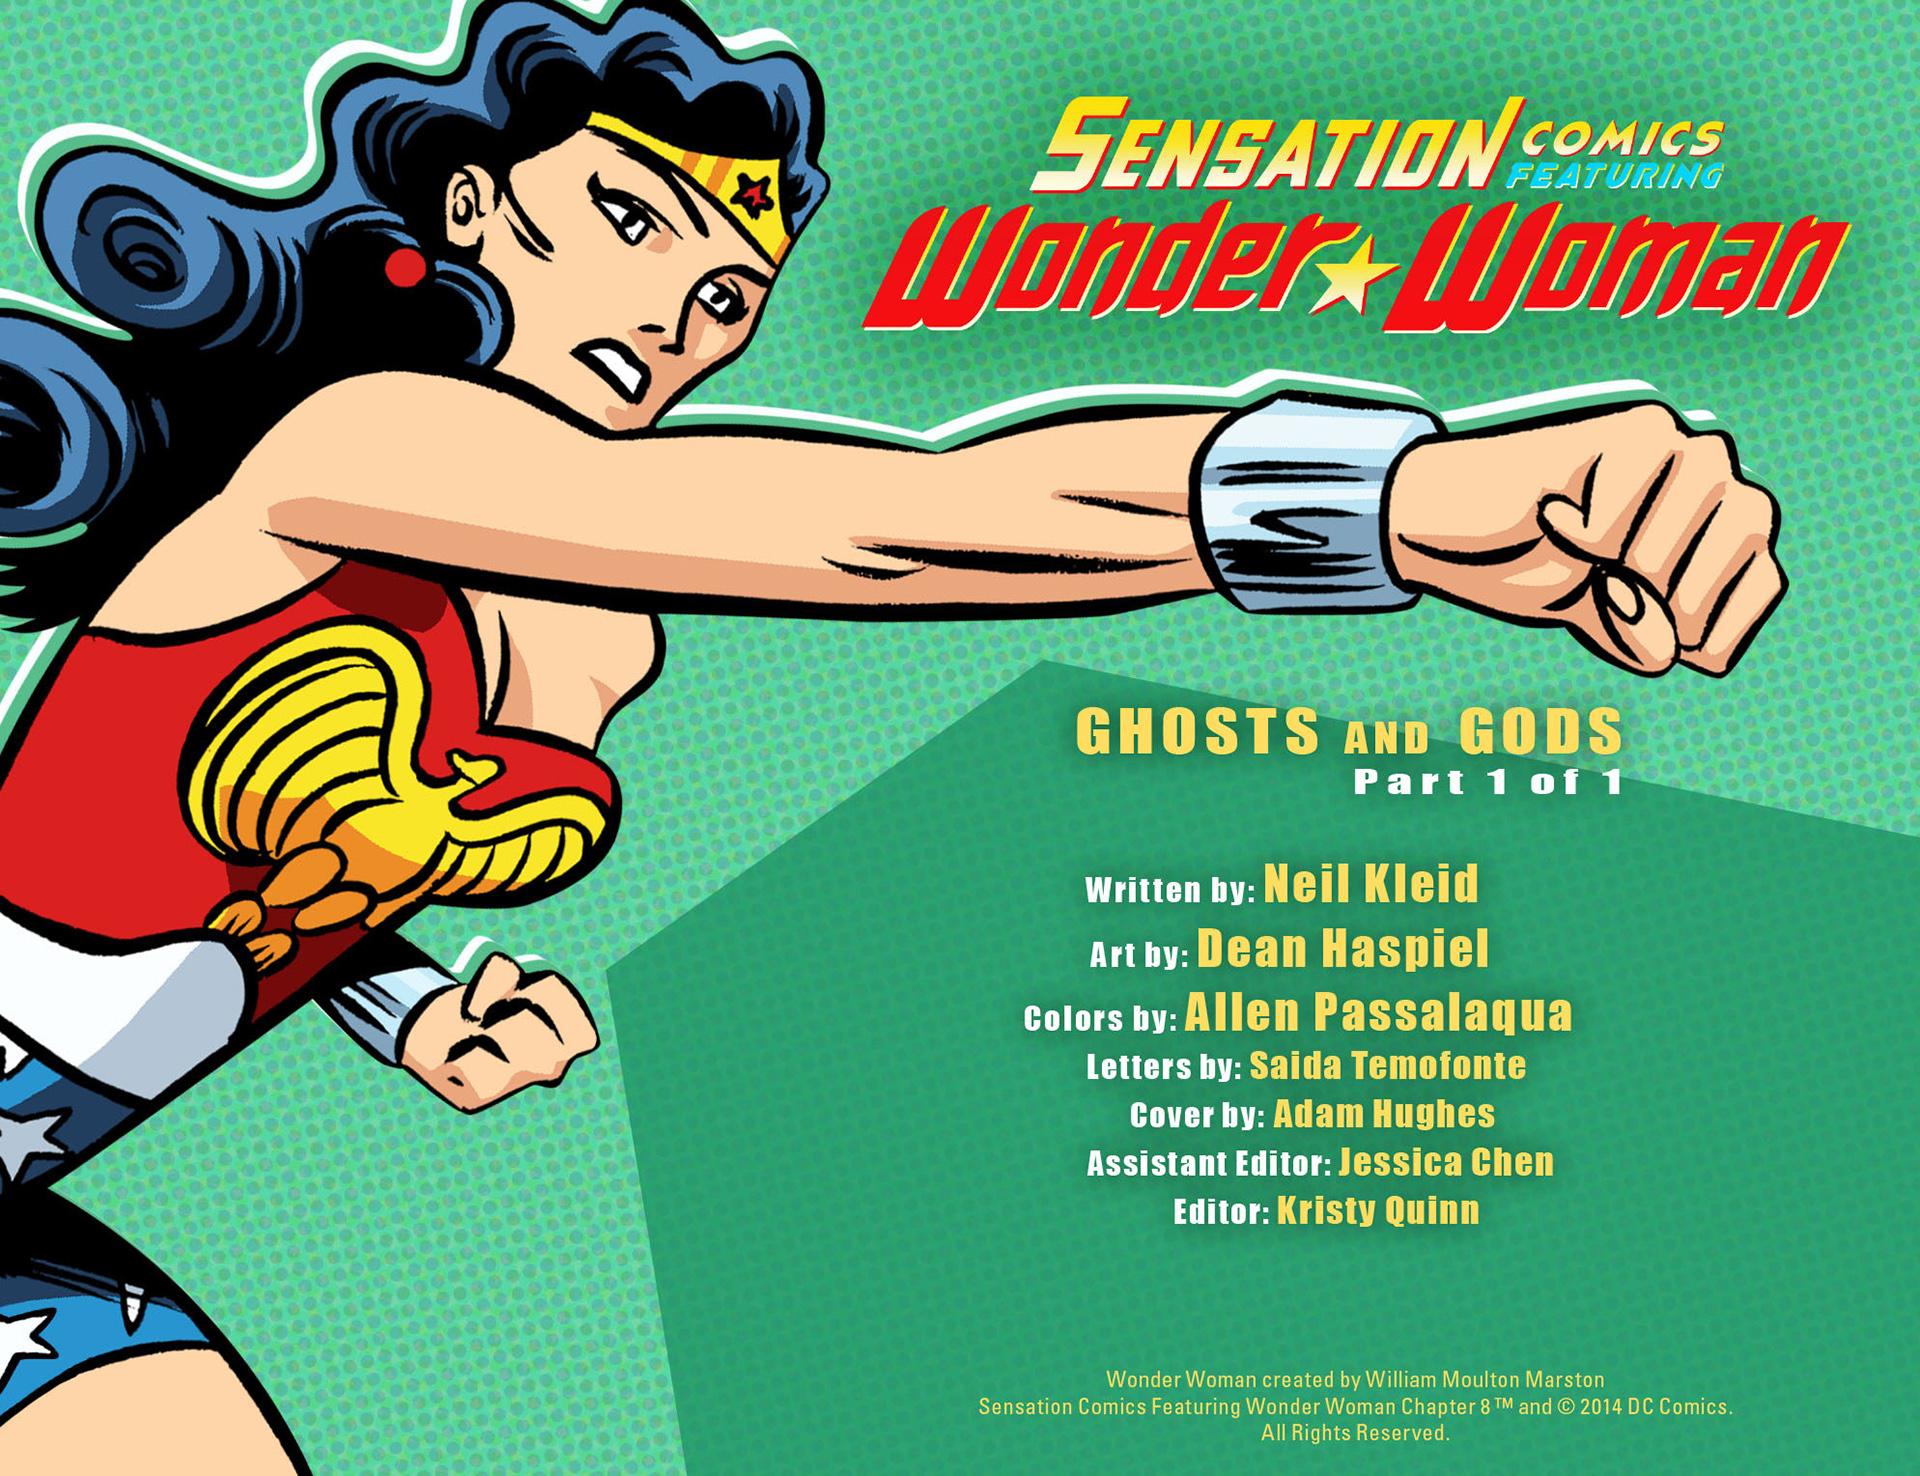 Read online Sensation Comics Featuring Wonder Woman comic -  Issue #8 - 2